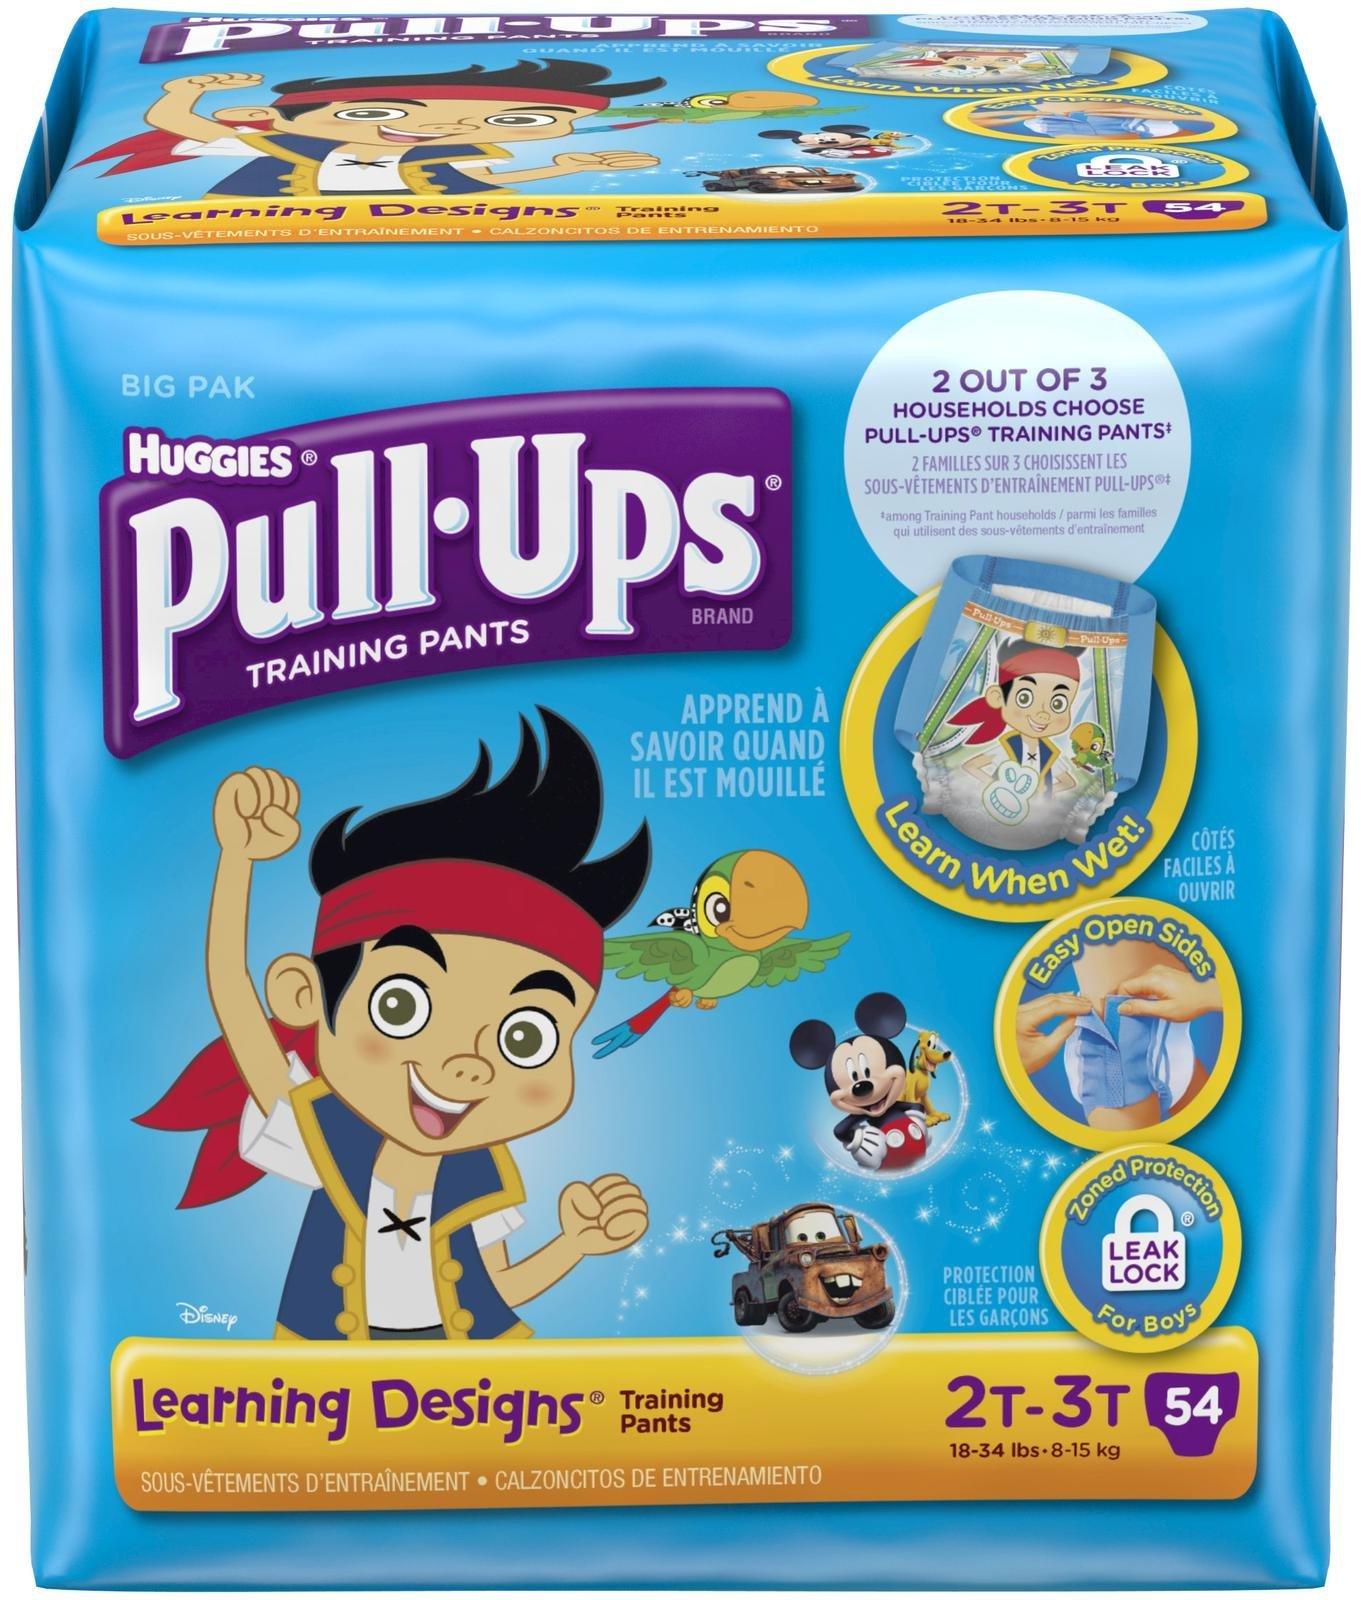 Huggies Pull-Ups Training Pants Learning Designs - Boys - 2T-3T - 54 ct